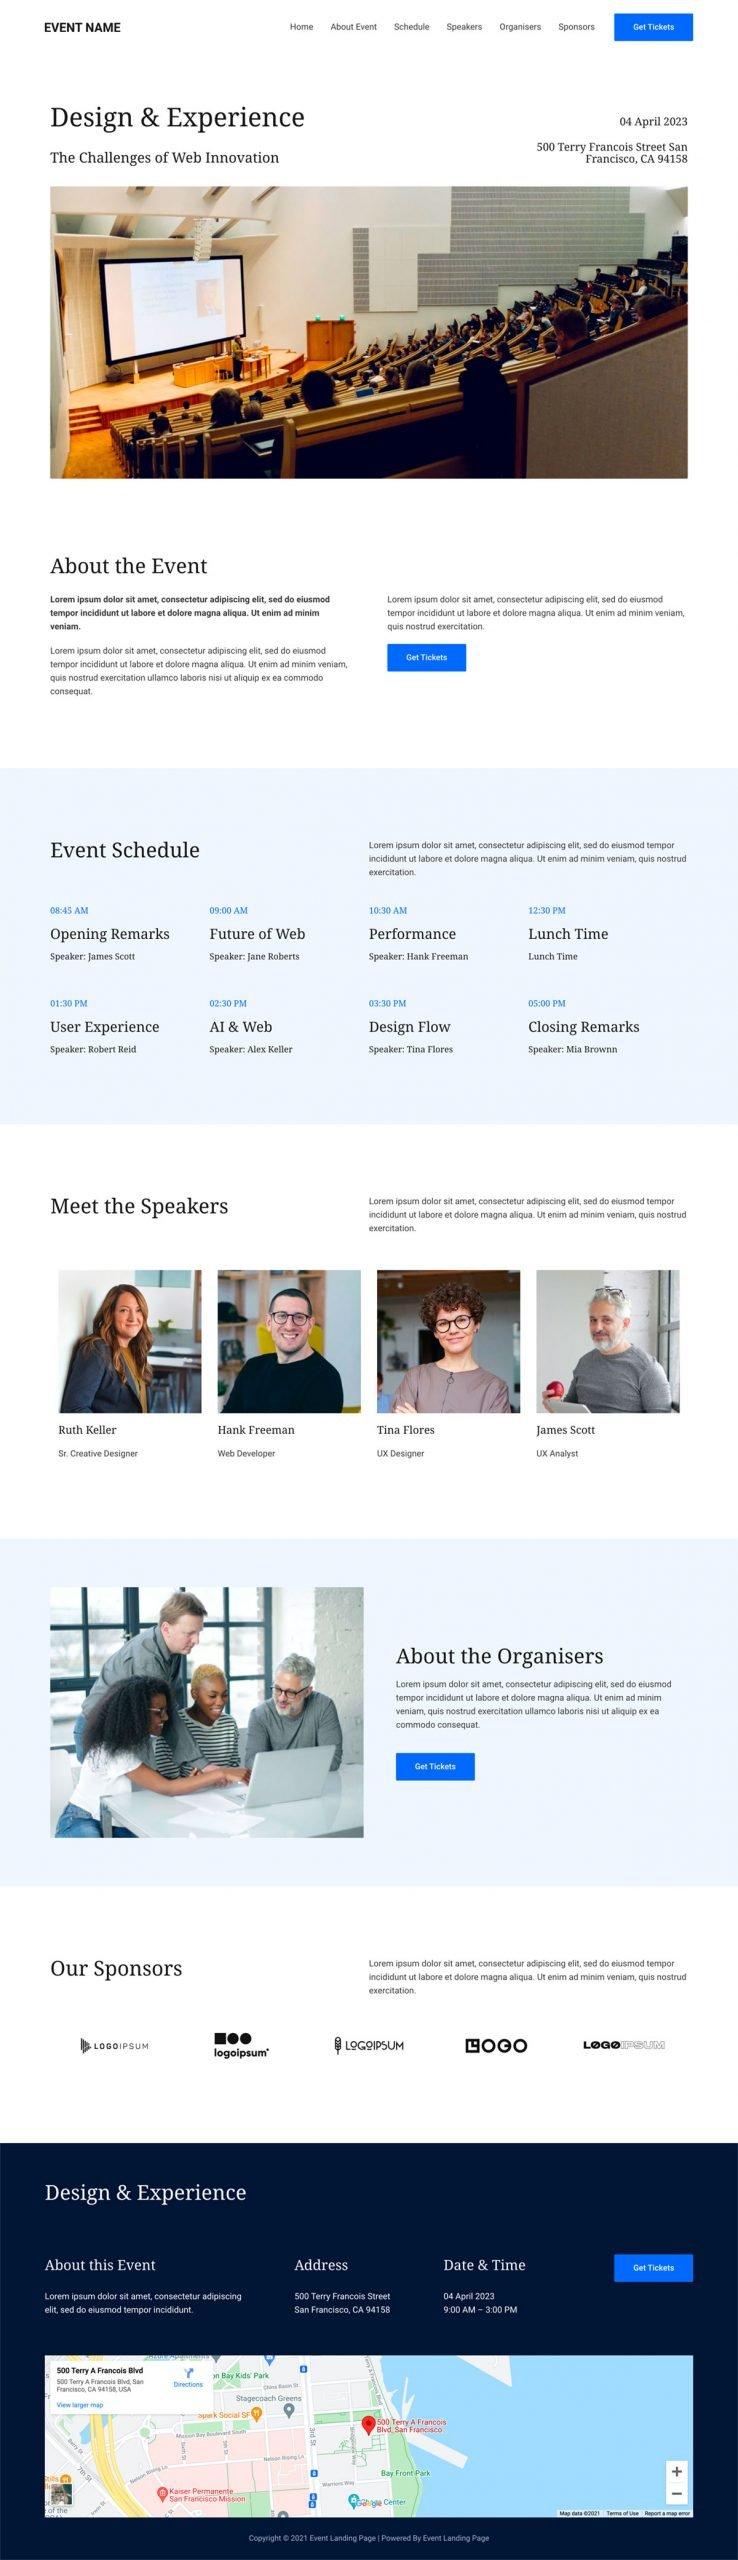 Event website design example